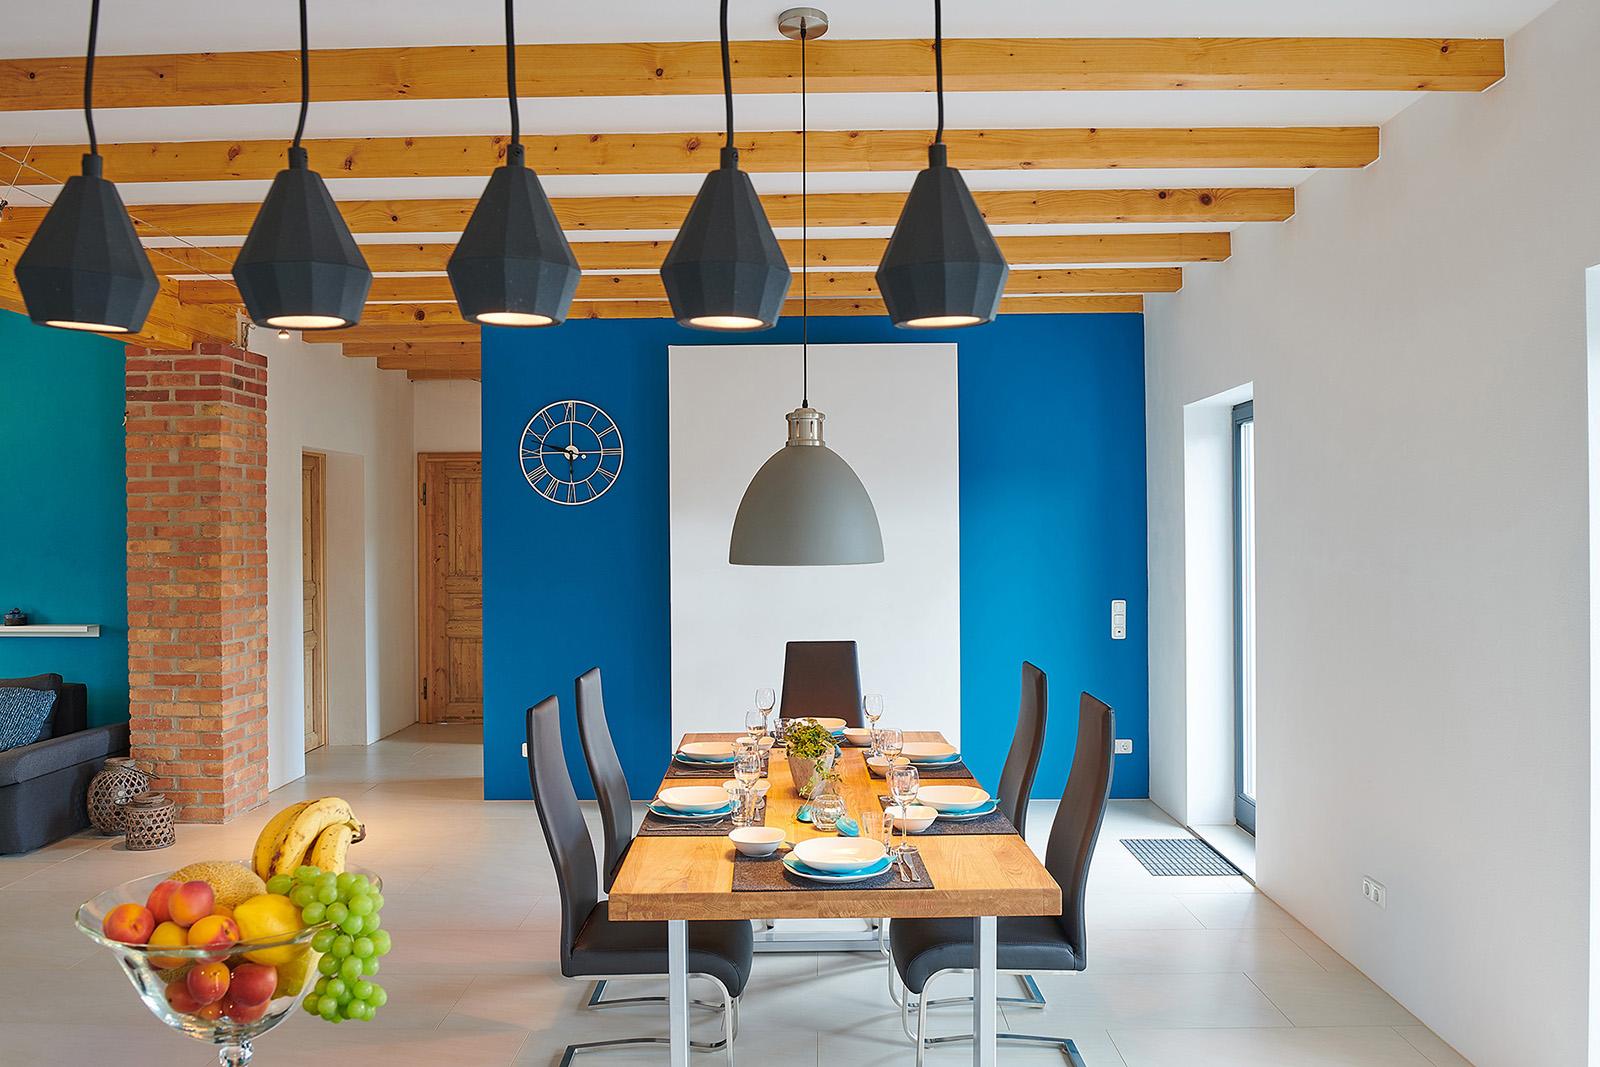 Fotodesign-matthias-schütz-ferienhaus-loft